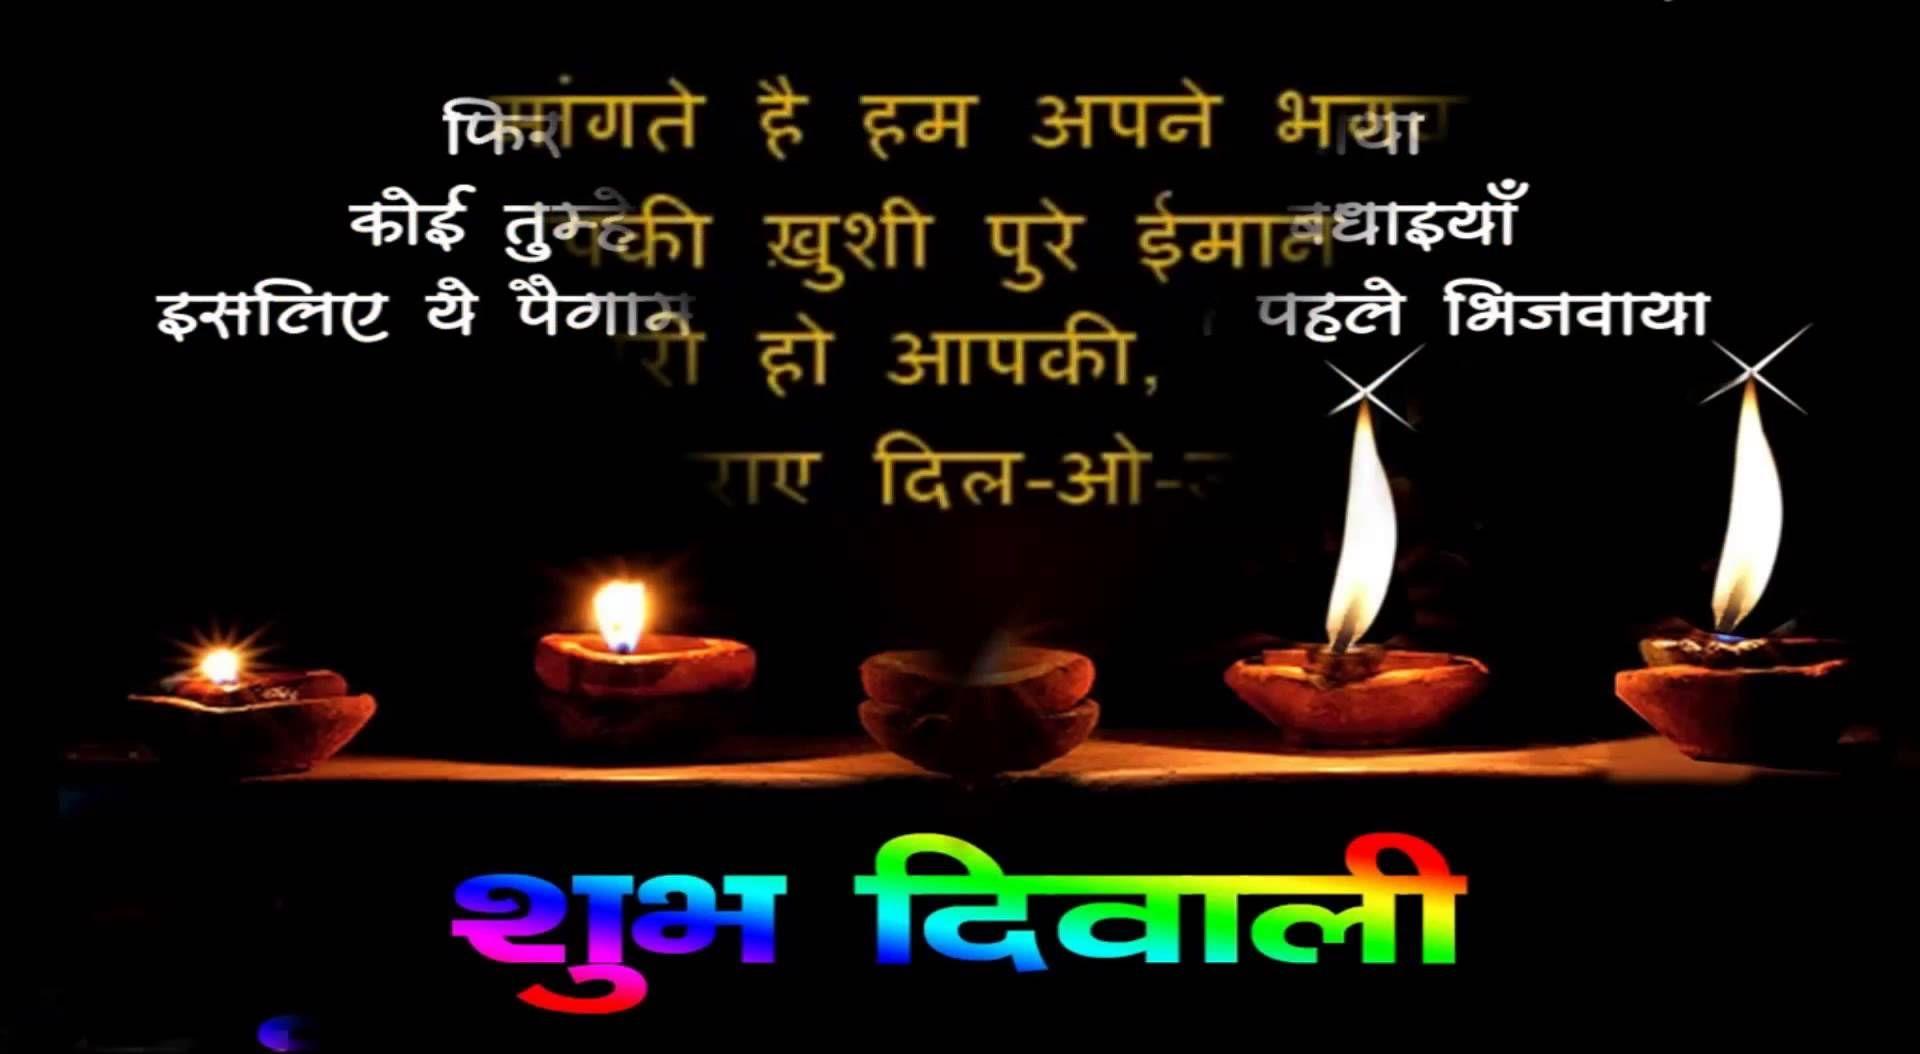 Funny Diwali Quotes In English Funny Diwali Quotes Happy Diwali Images Diwali Quotes In English